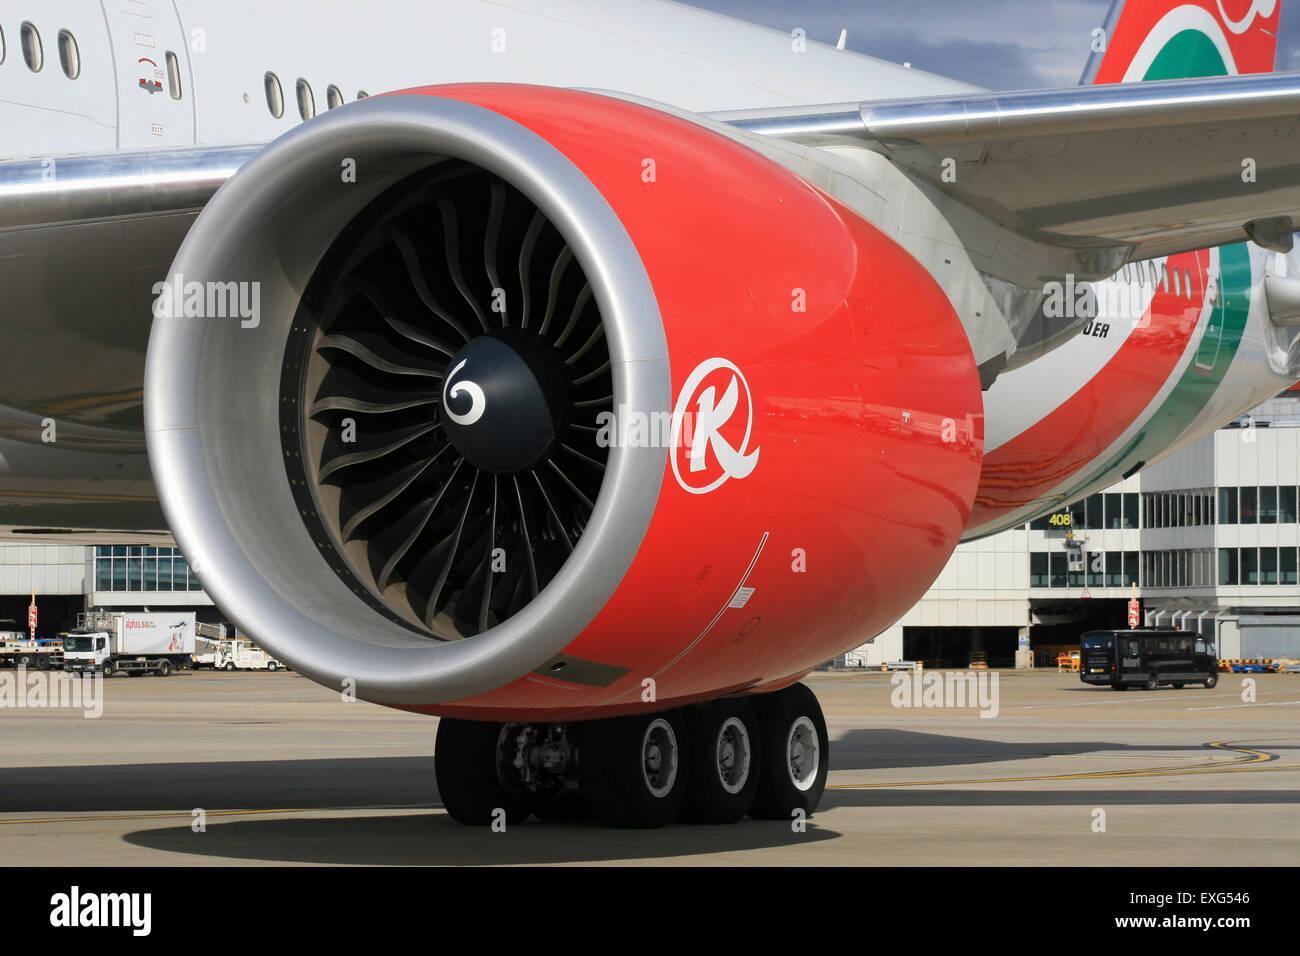 777 ENGINE POWERPLANT GENERAL ELECTRIC PRATT WITNEY ROLLS ROYCE - Stock Image